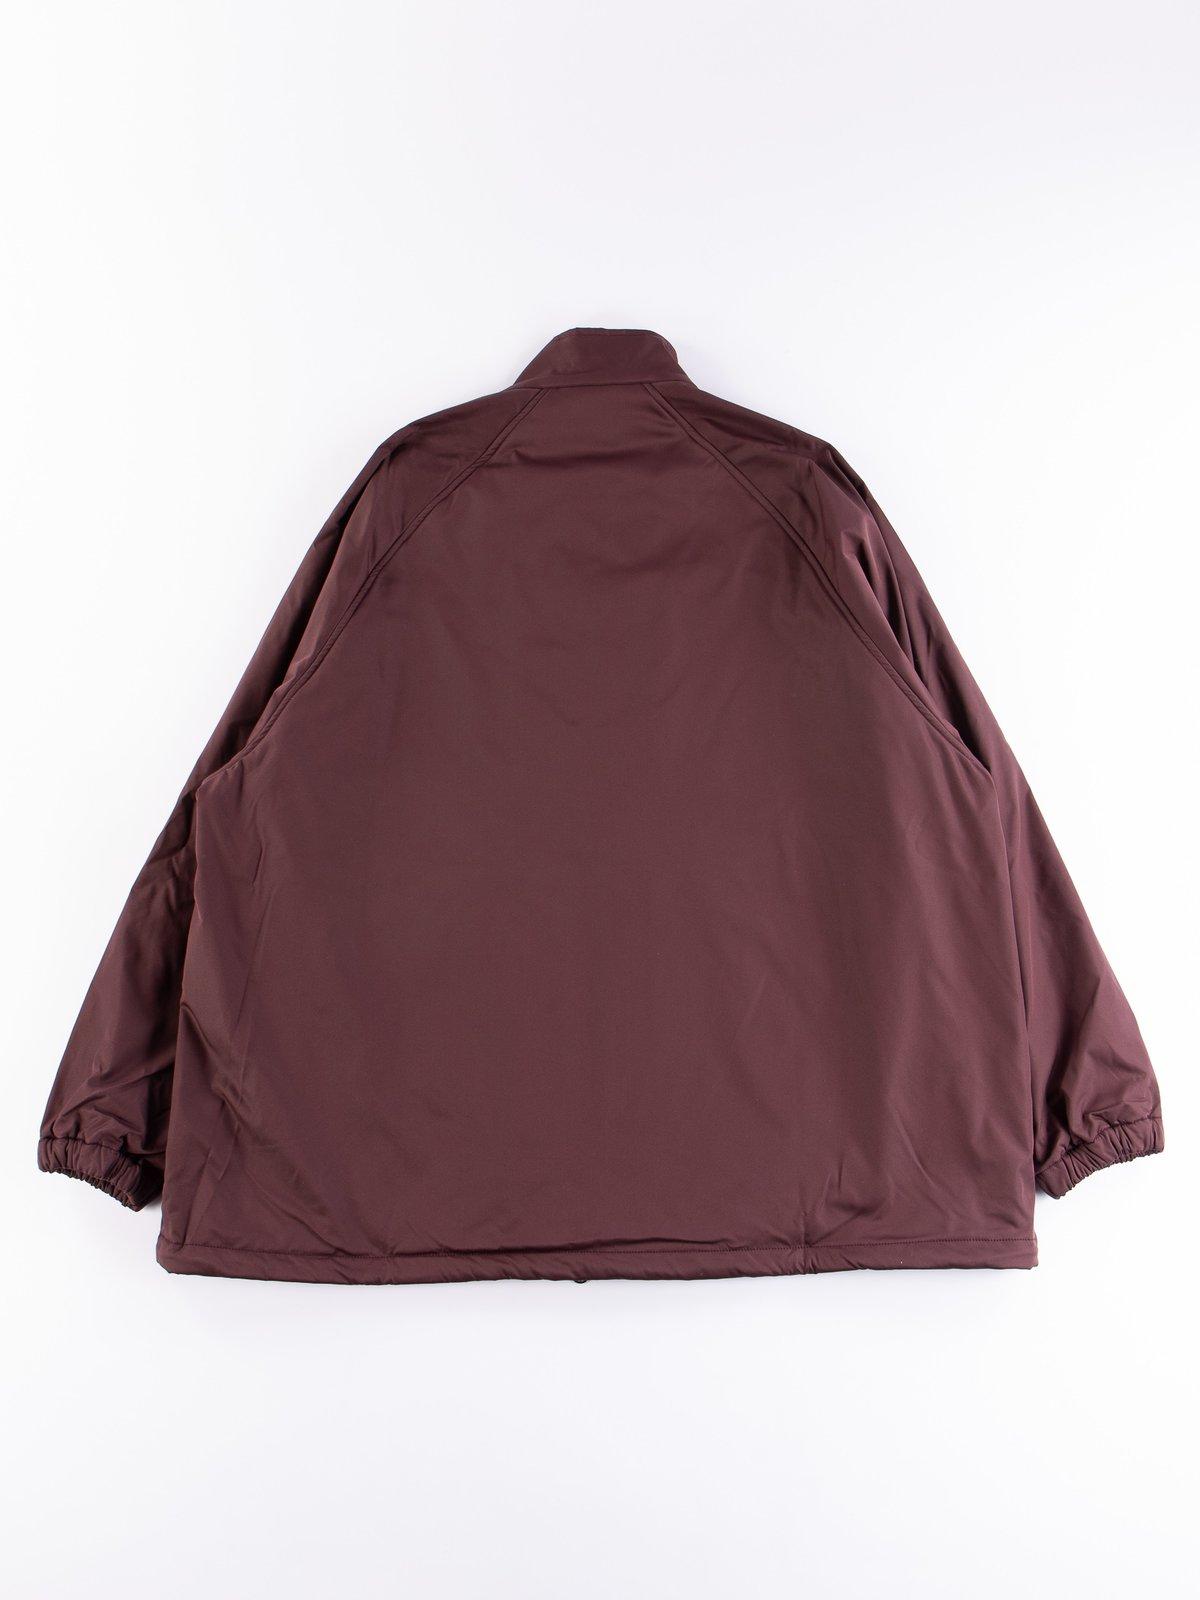 Bordeaux Jog Jacket - Image 5